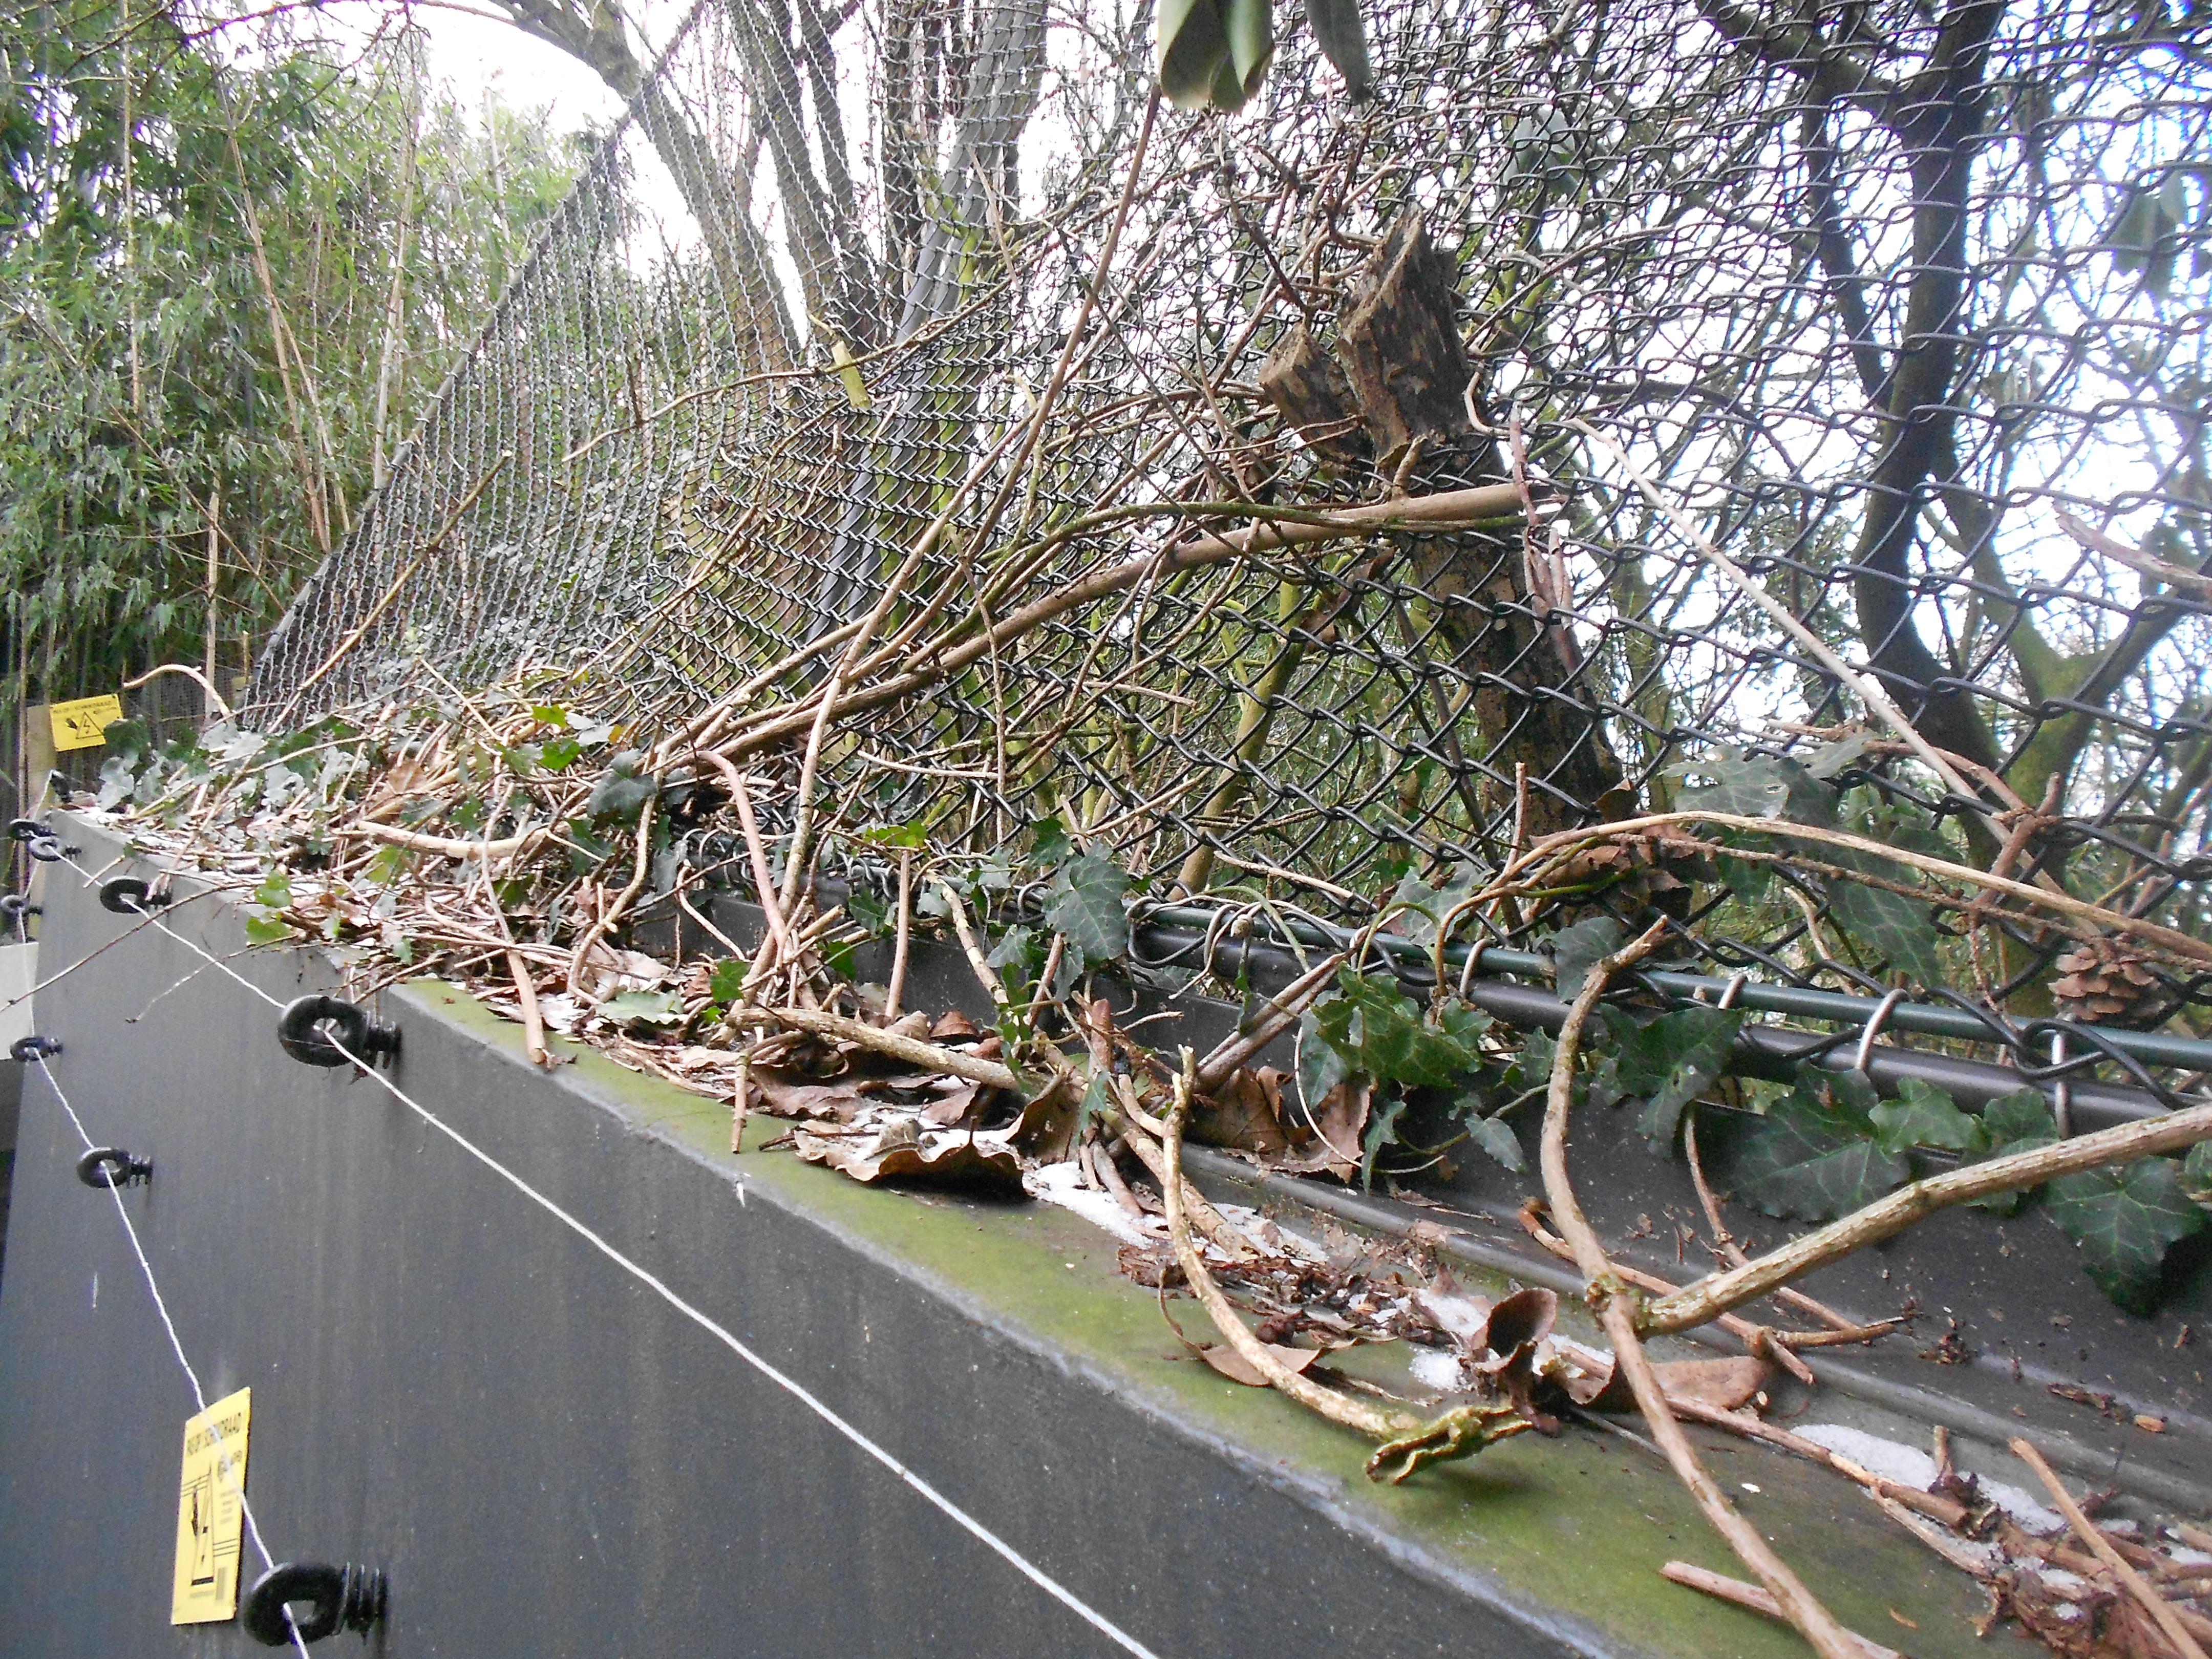 Dierenpark Emmen - American Free-flight aviary (1)